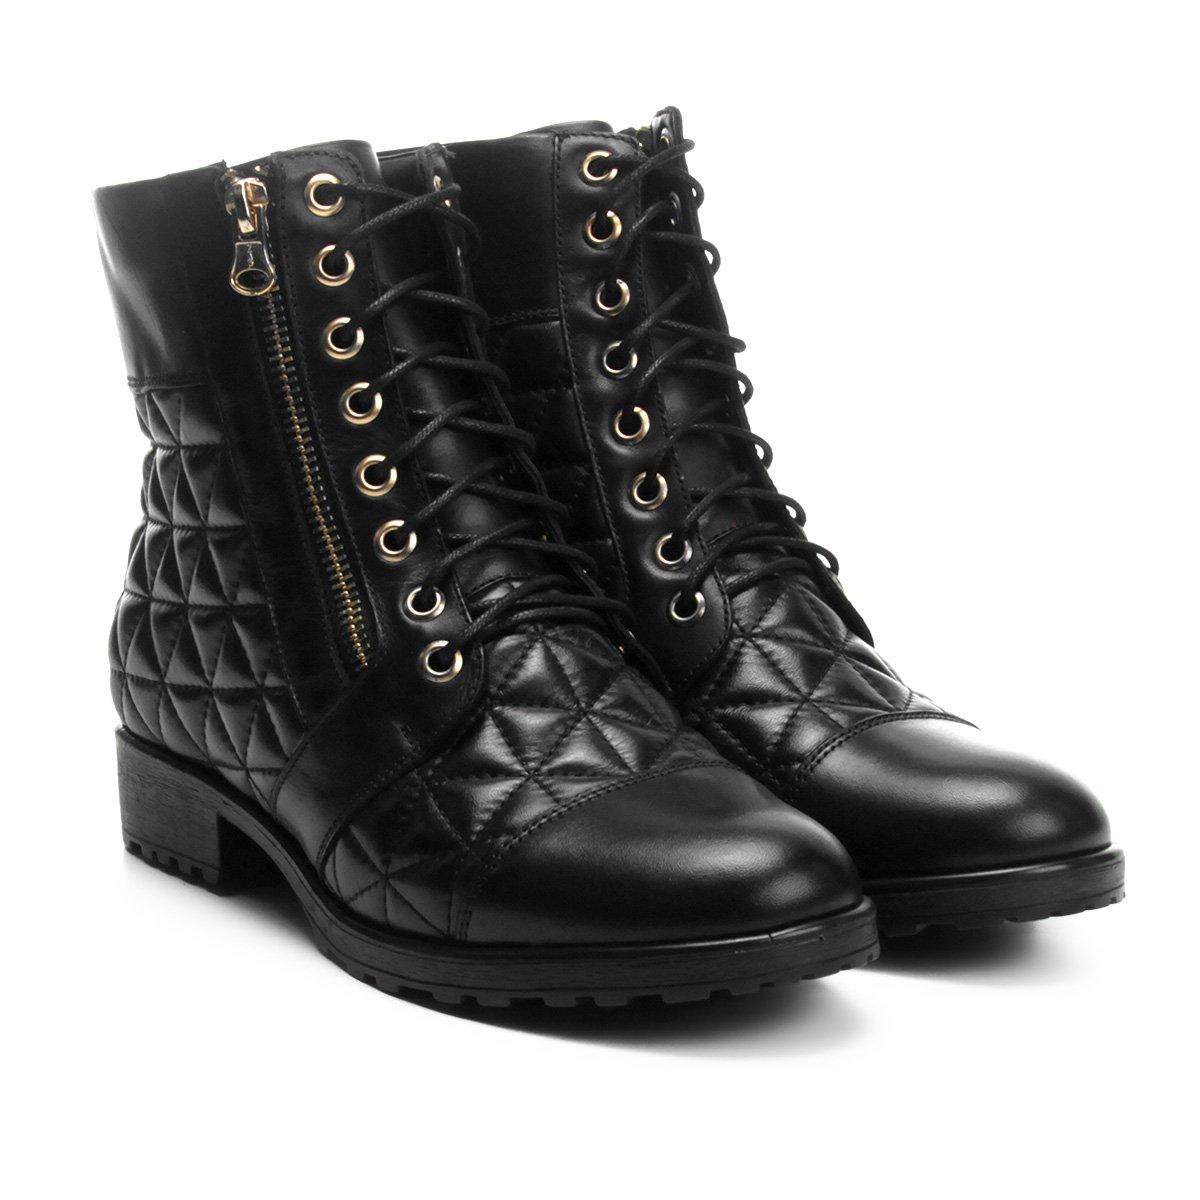 8f90bafcfb Bota Couro Cano Curto Shoestock Coturno Matelassê Feminina